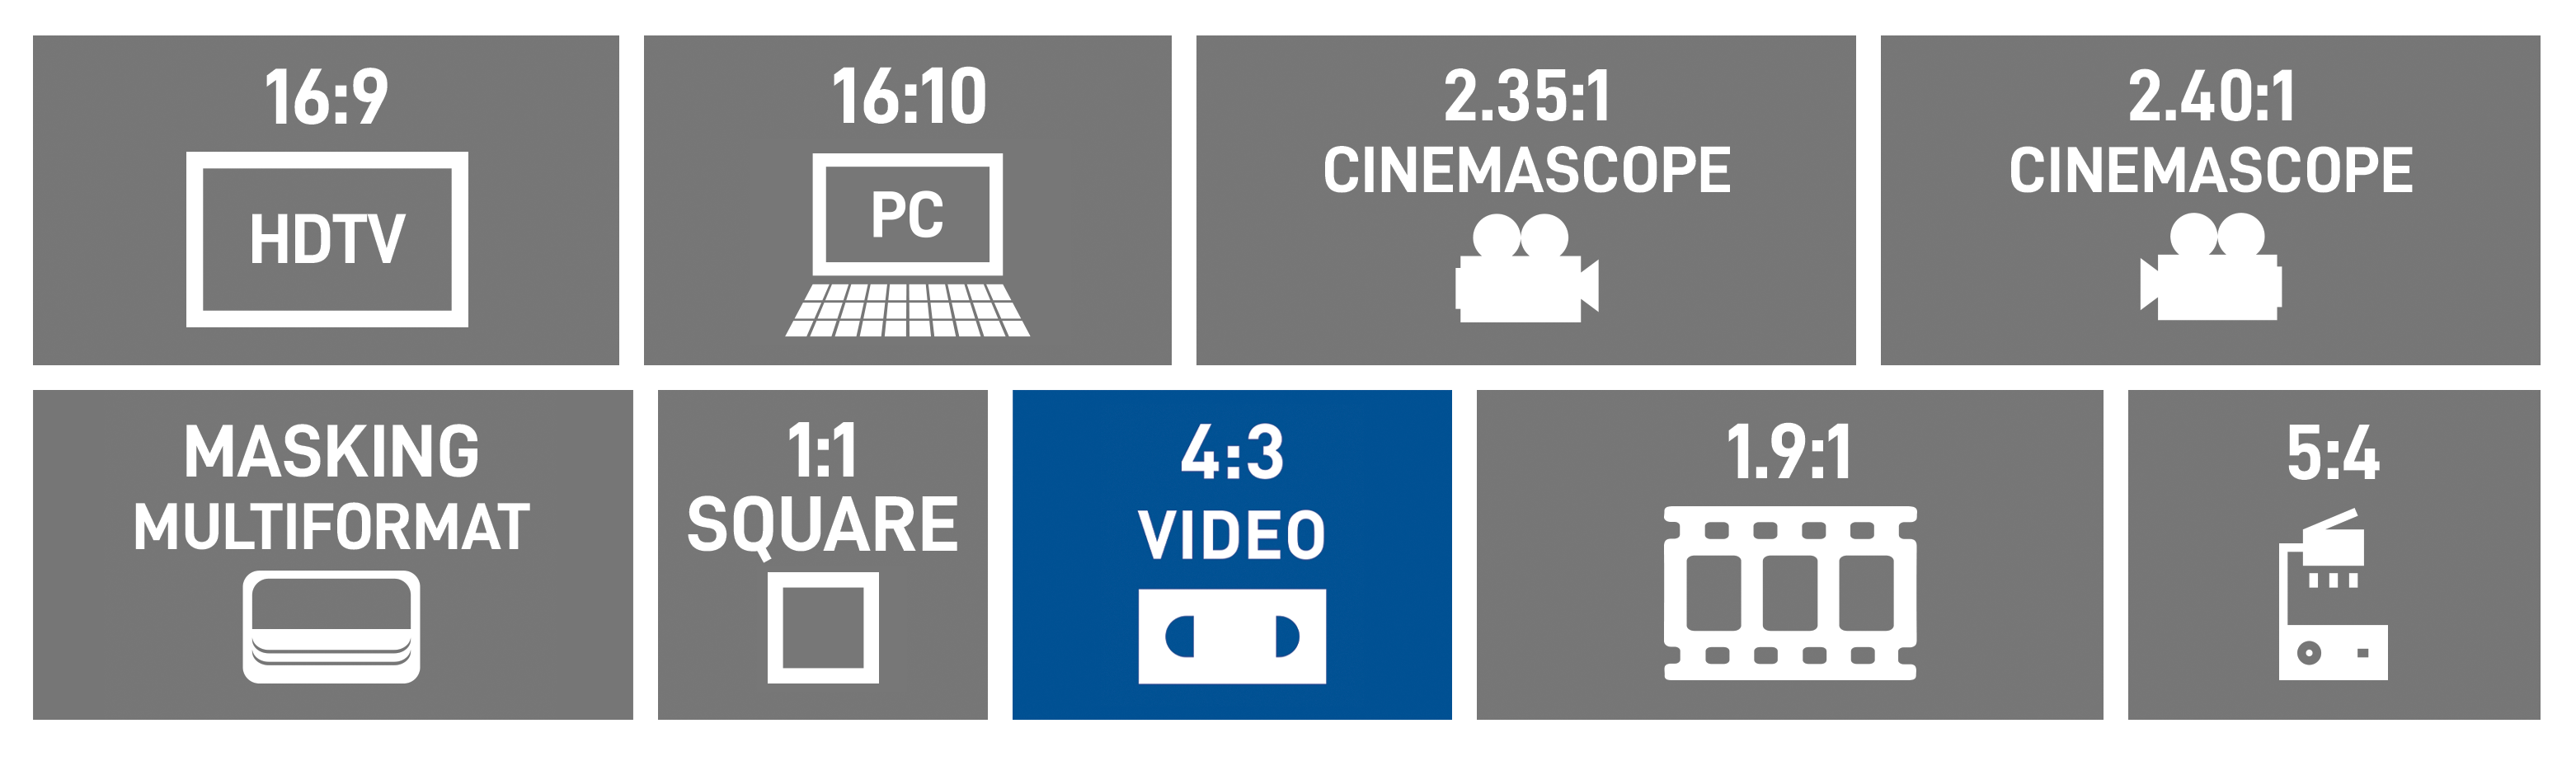 4:3 Video Format